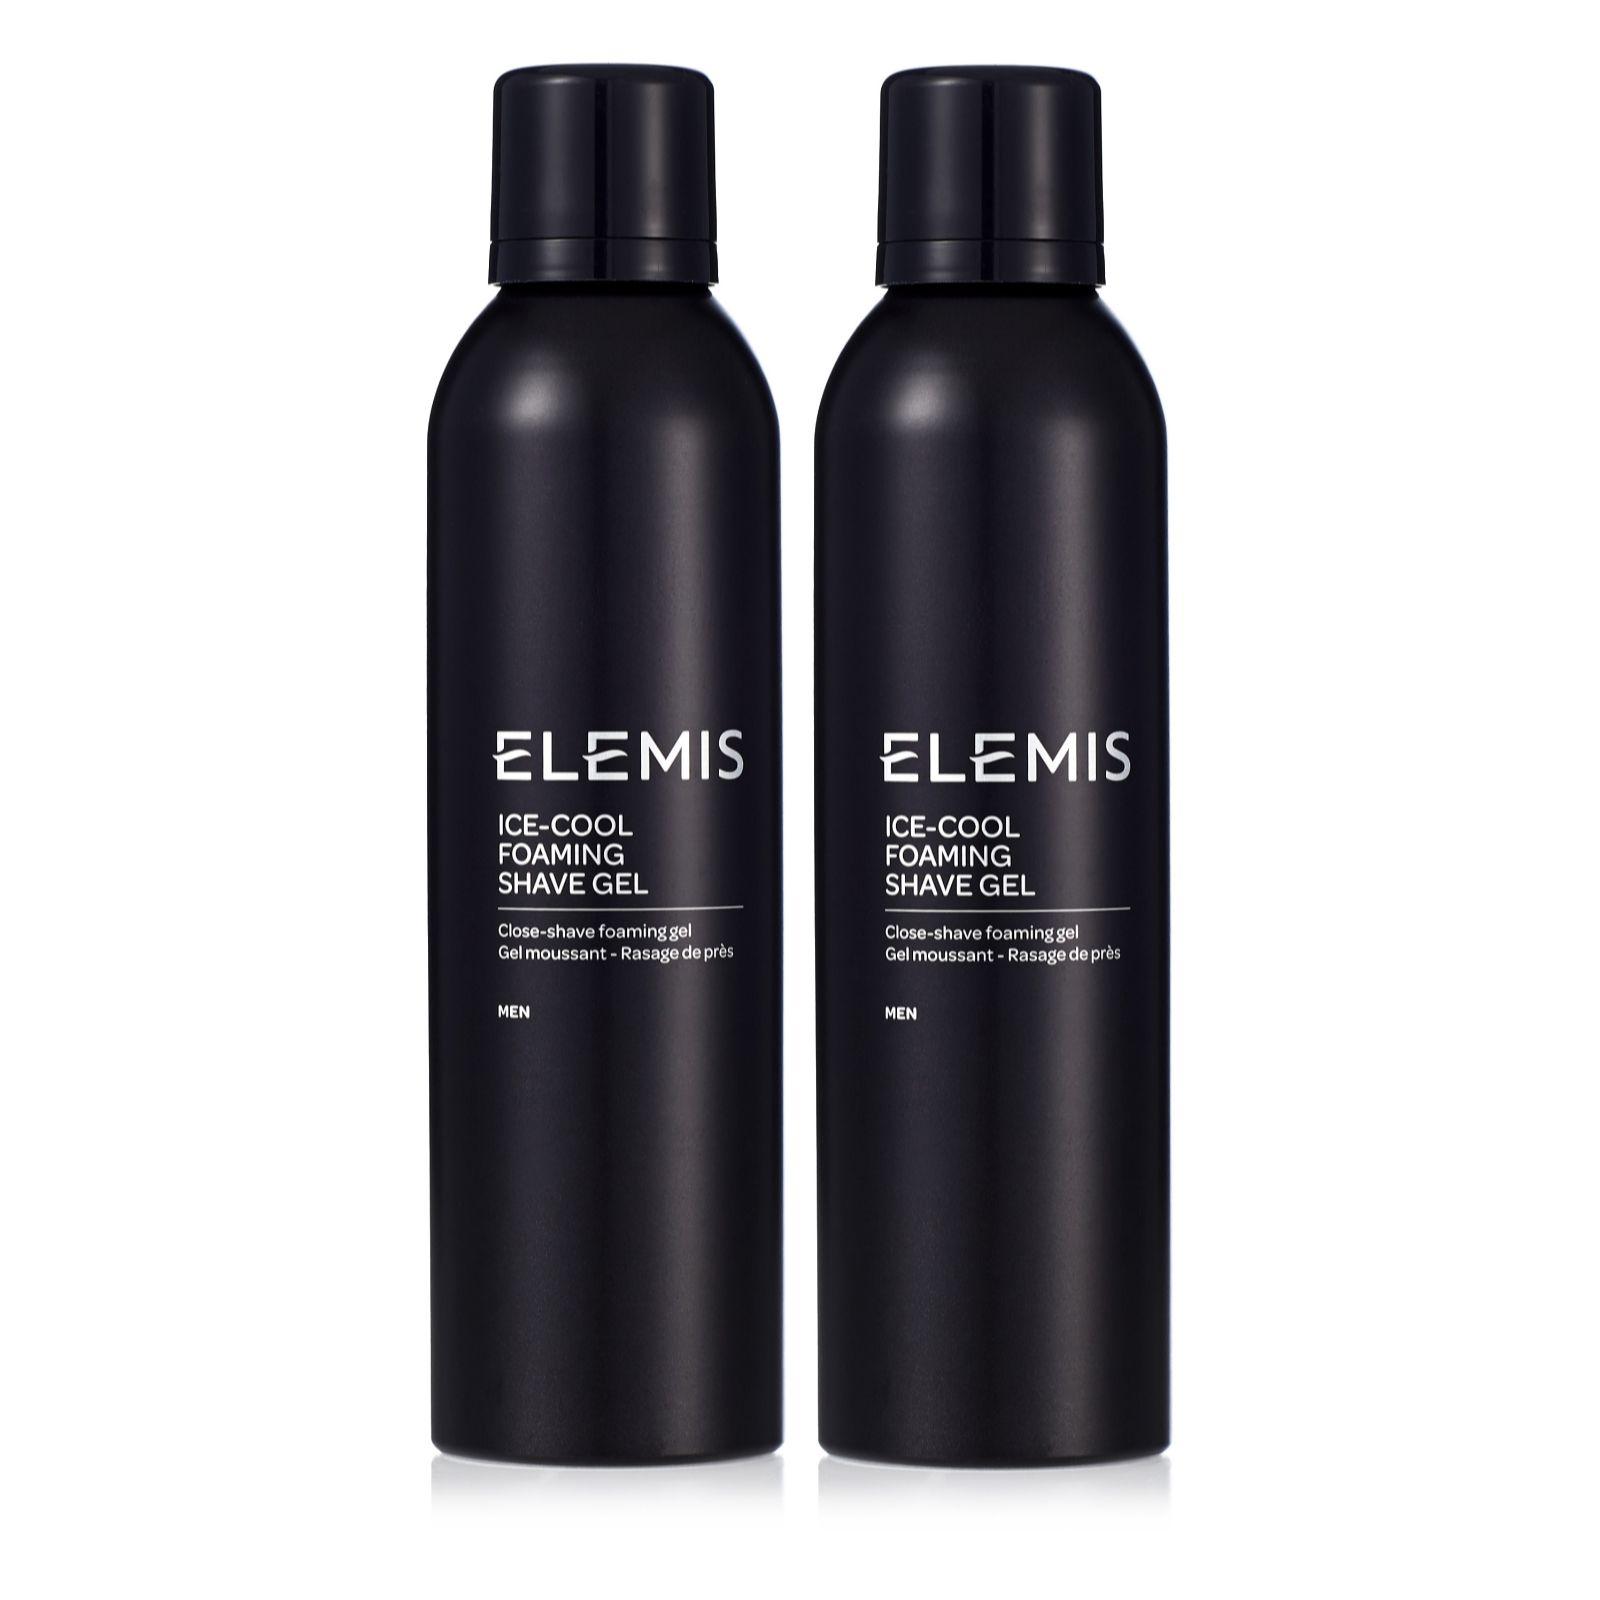 Elemis Ice Cool Foaming Shaving Gel Duo 200ml Page 1 QVC UK